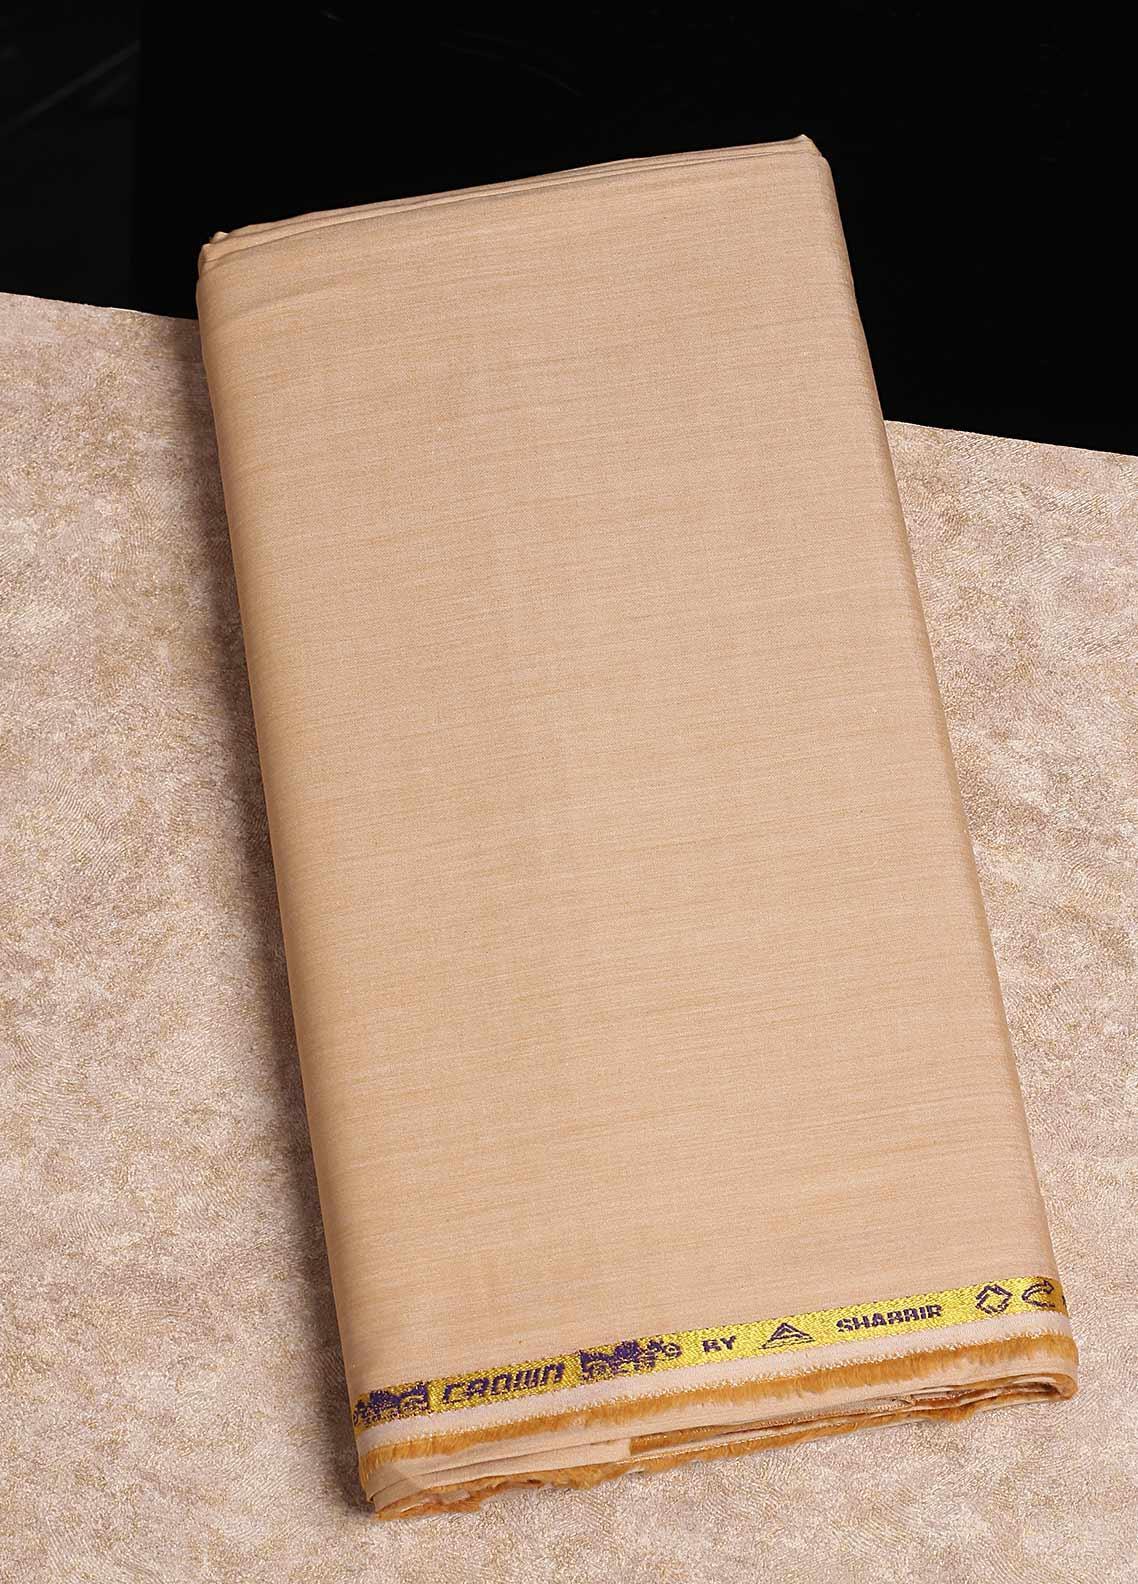 Shabbir Fabrics Plain Chambray Unstitched Fabric SHB-0055 DARK YELLOW - Summer Collection